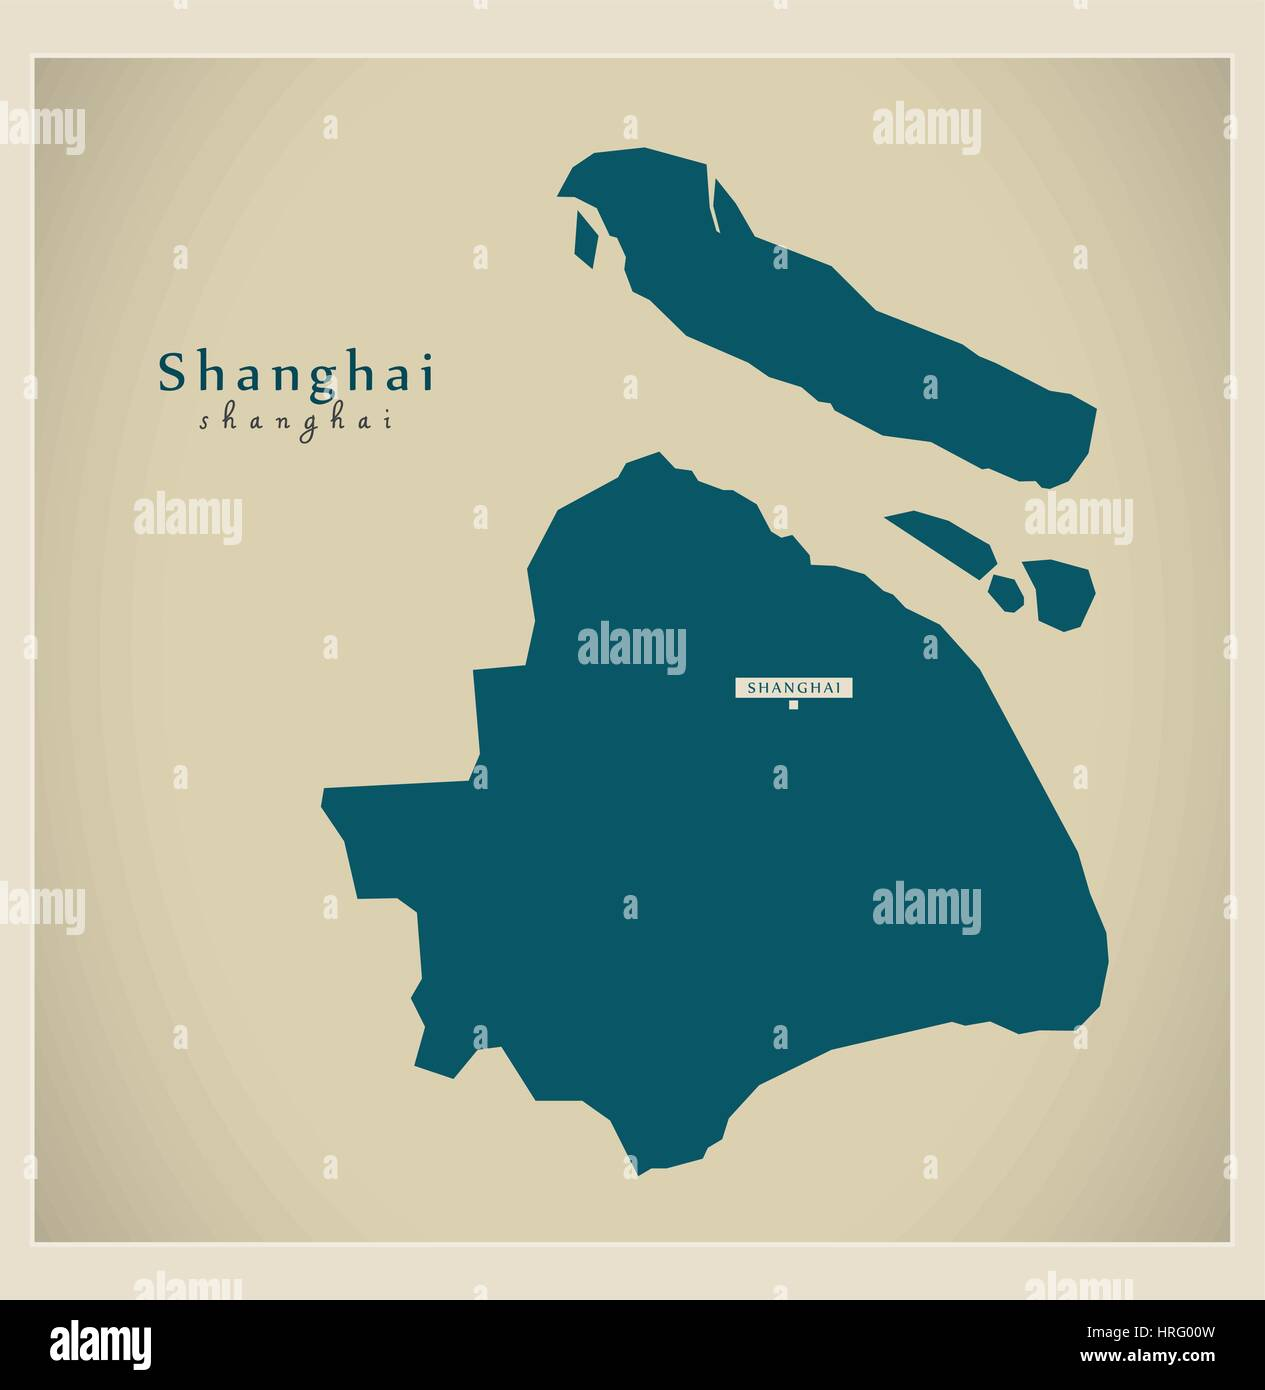 Modern Map - Shanghai - Stock Image